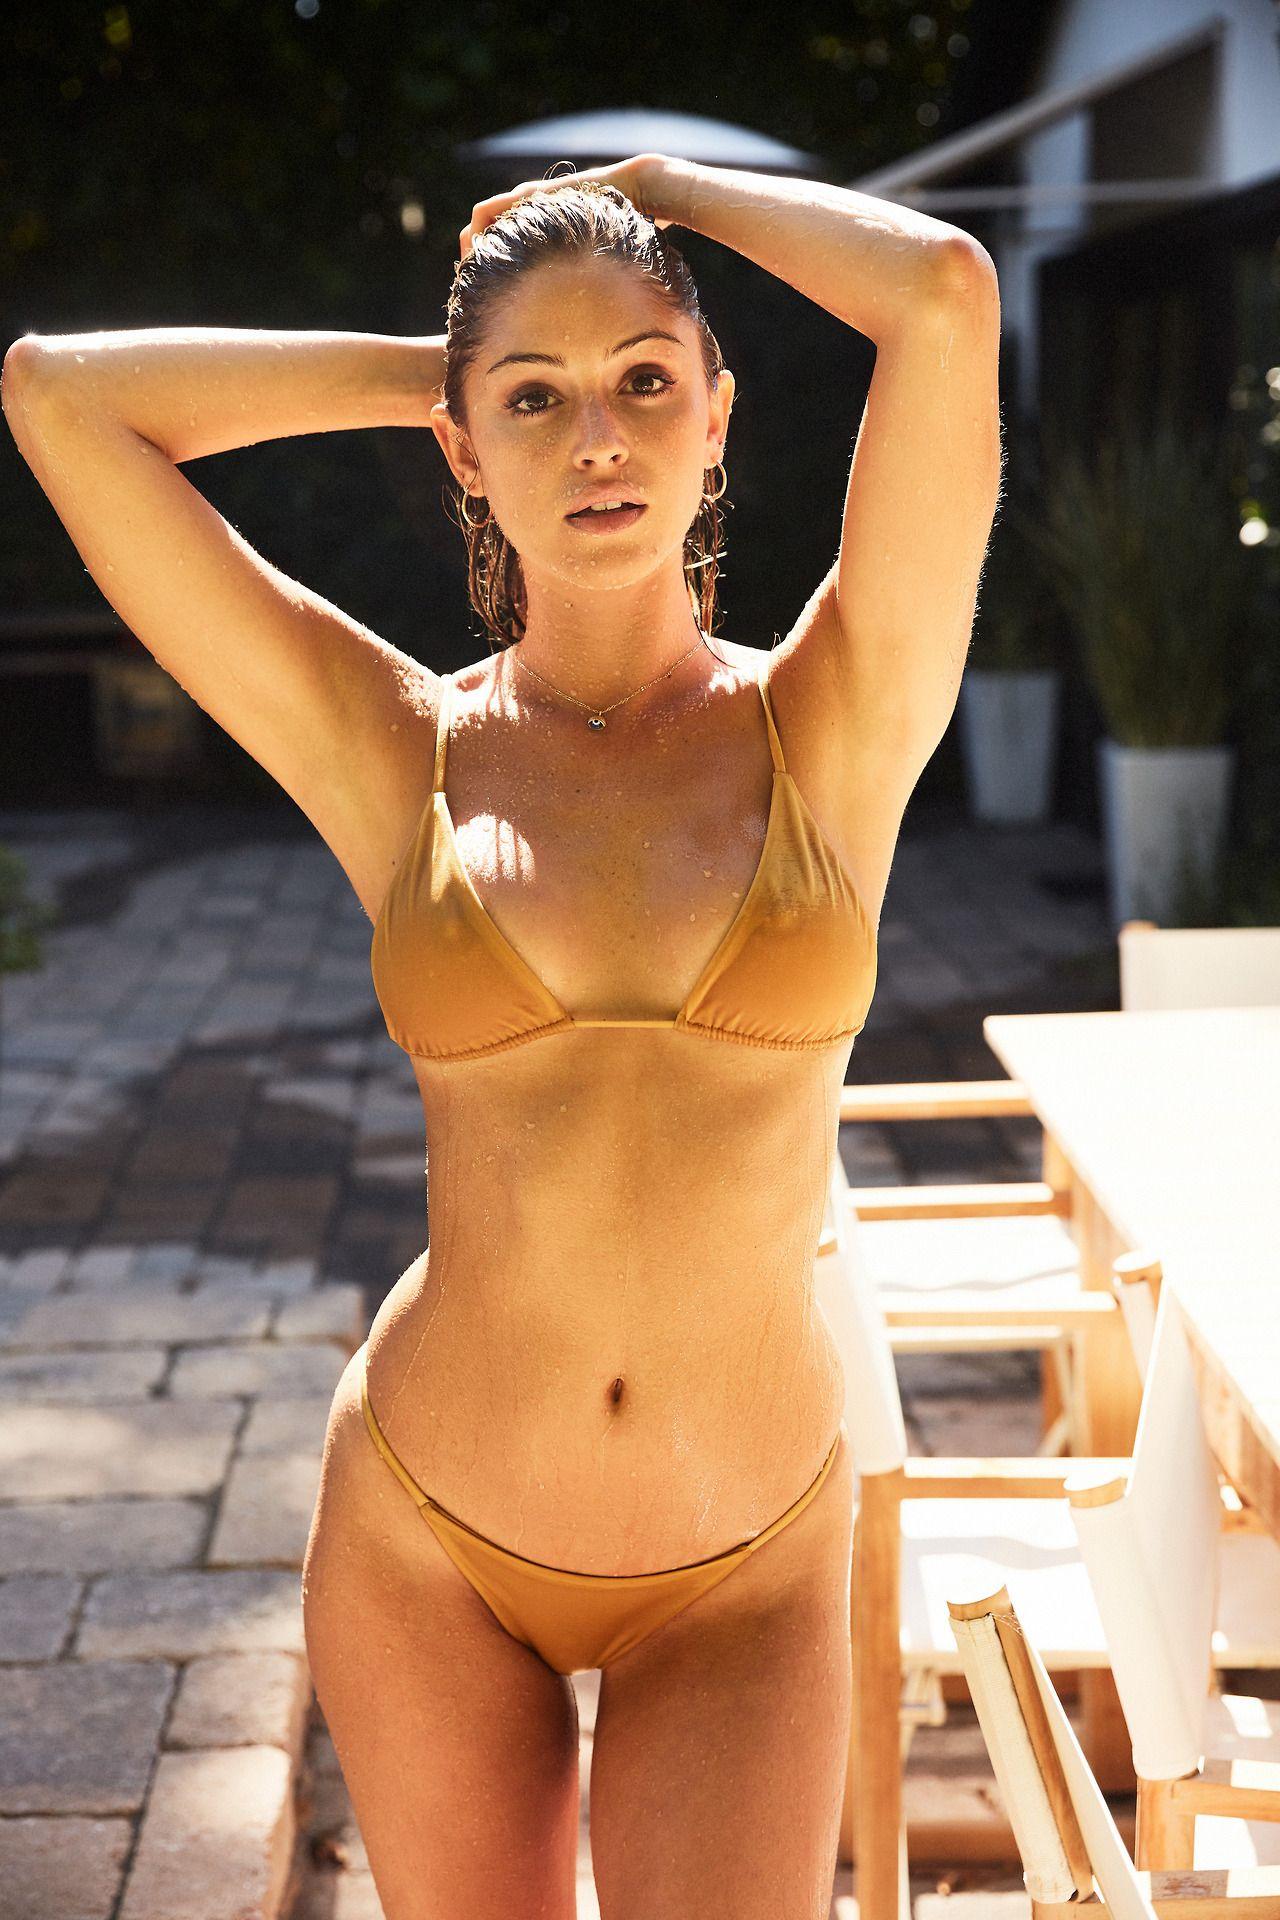 Paparazzi Gigi Paris nudes (91 photo), Topless, Is a cute, Boobs, lingerie 2015